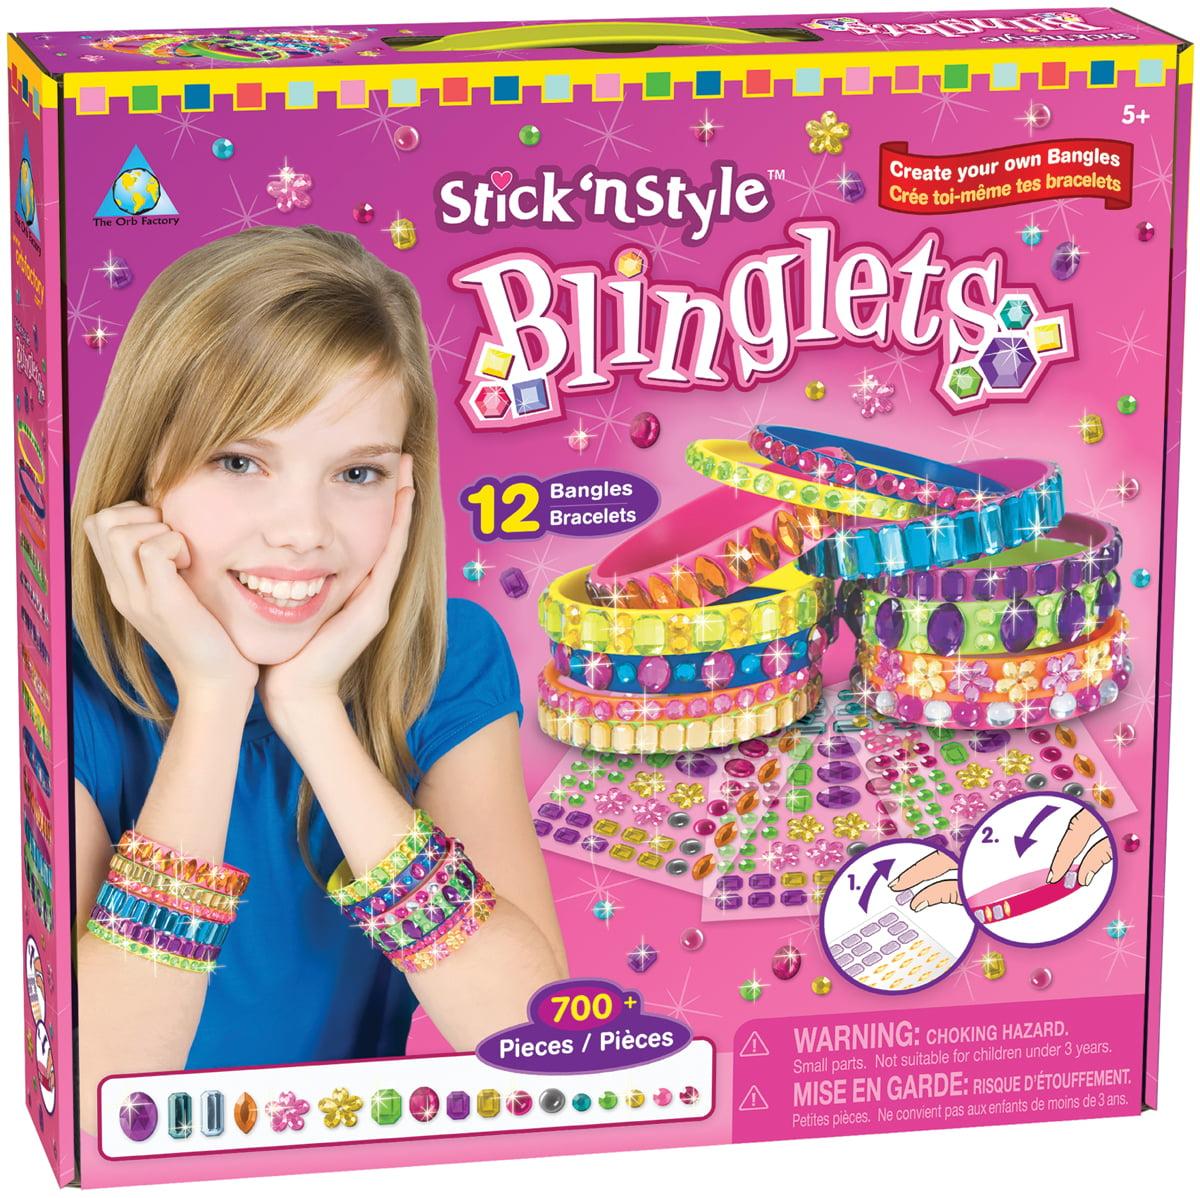 Stick 'n Style Kit-Blinglets